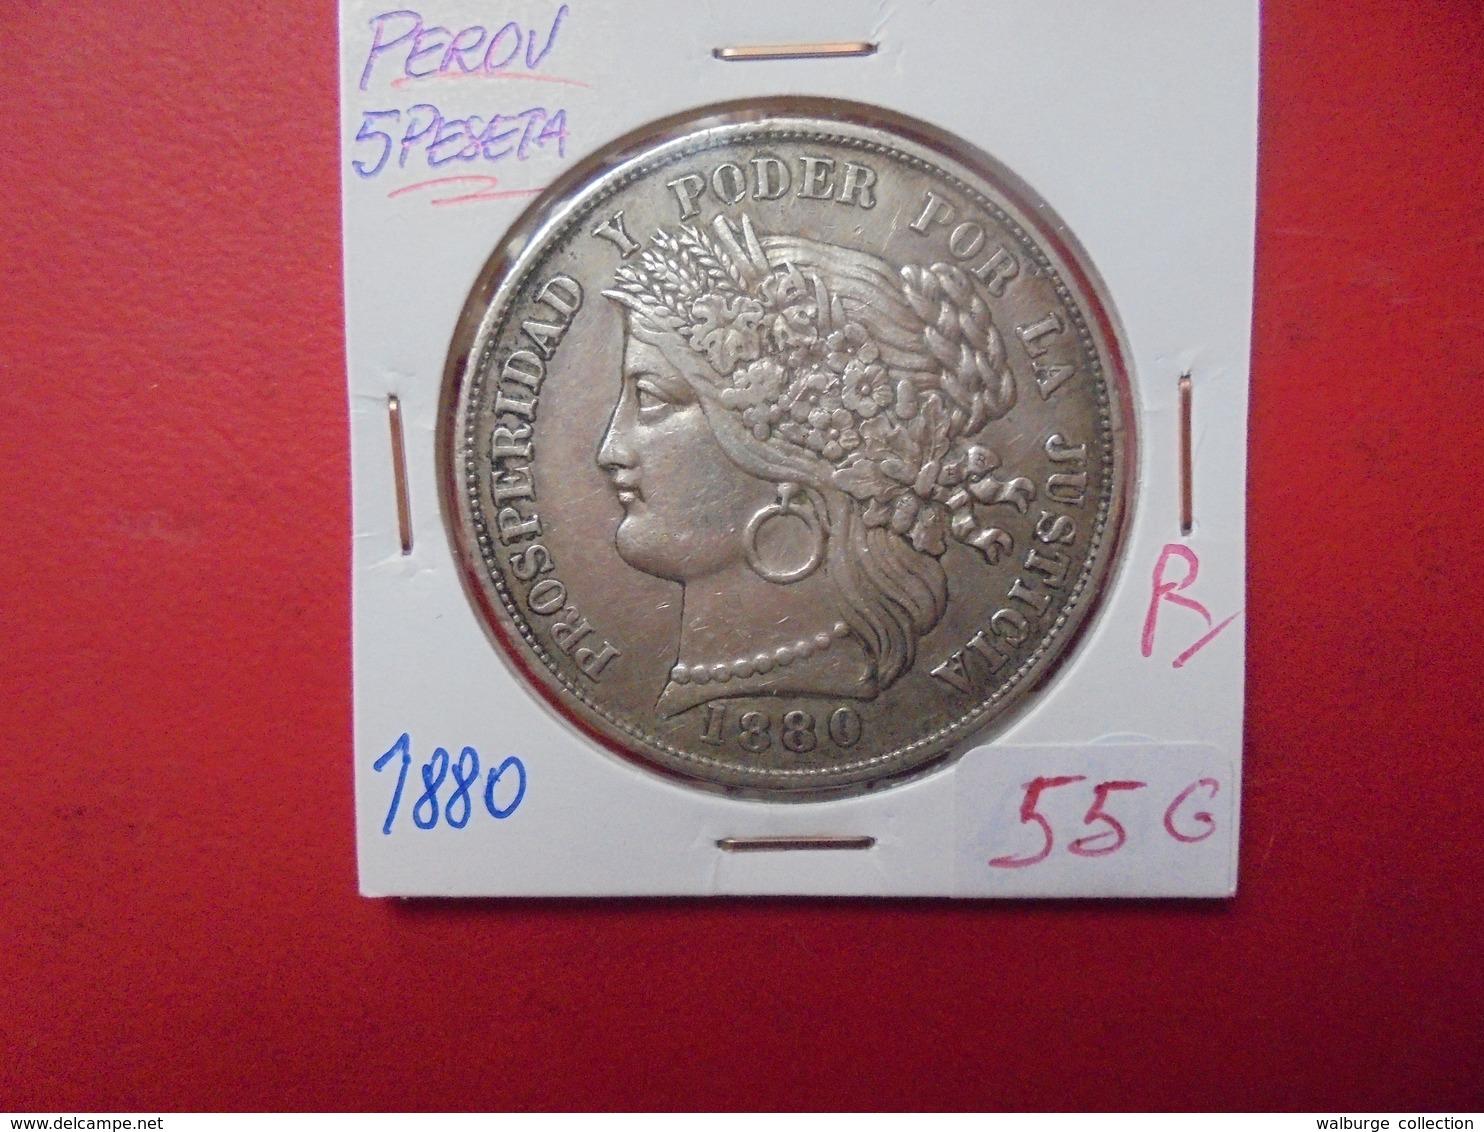 PEROU 5 PESETA 1880 ARGENT. PEU COURANTE ! - Perú